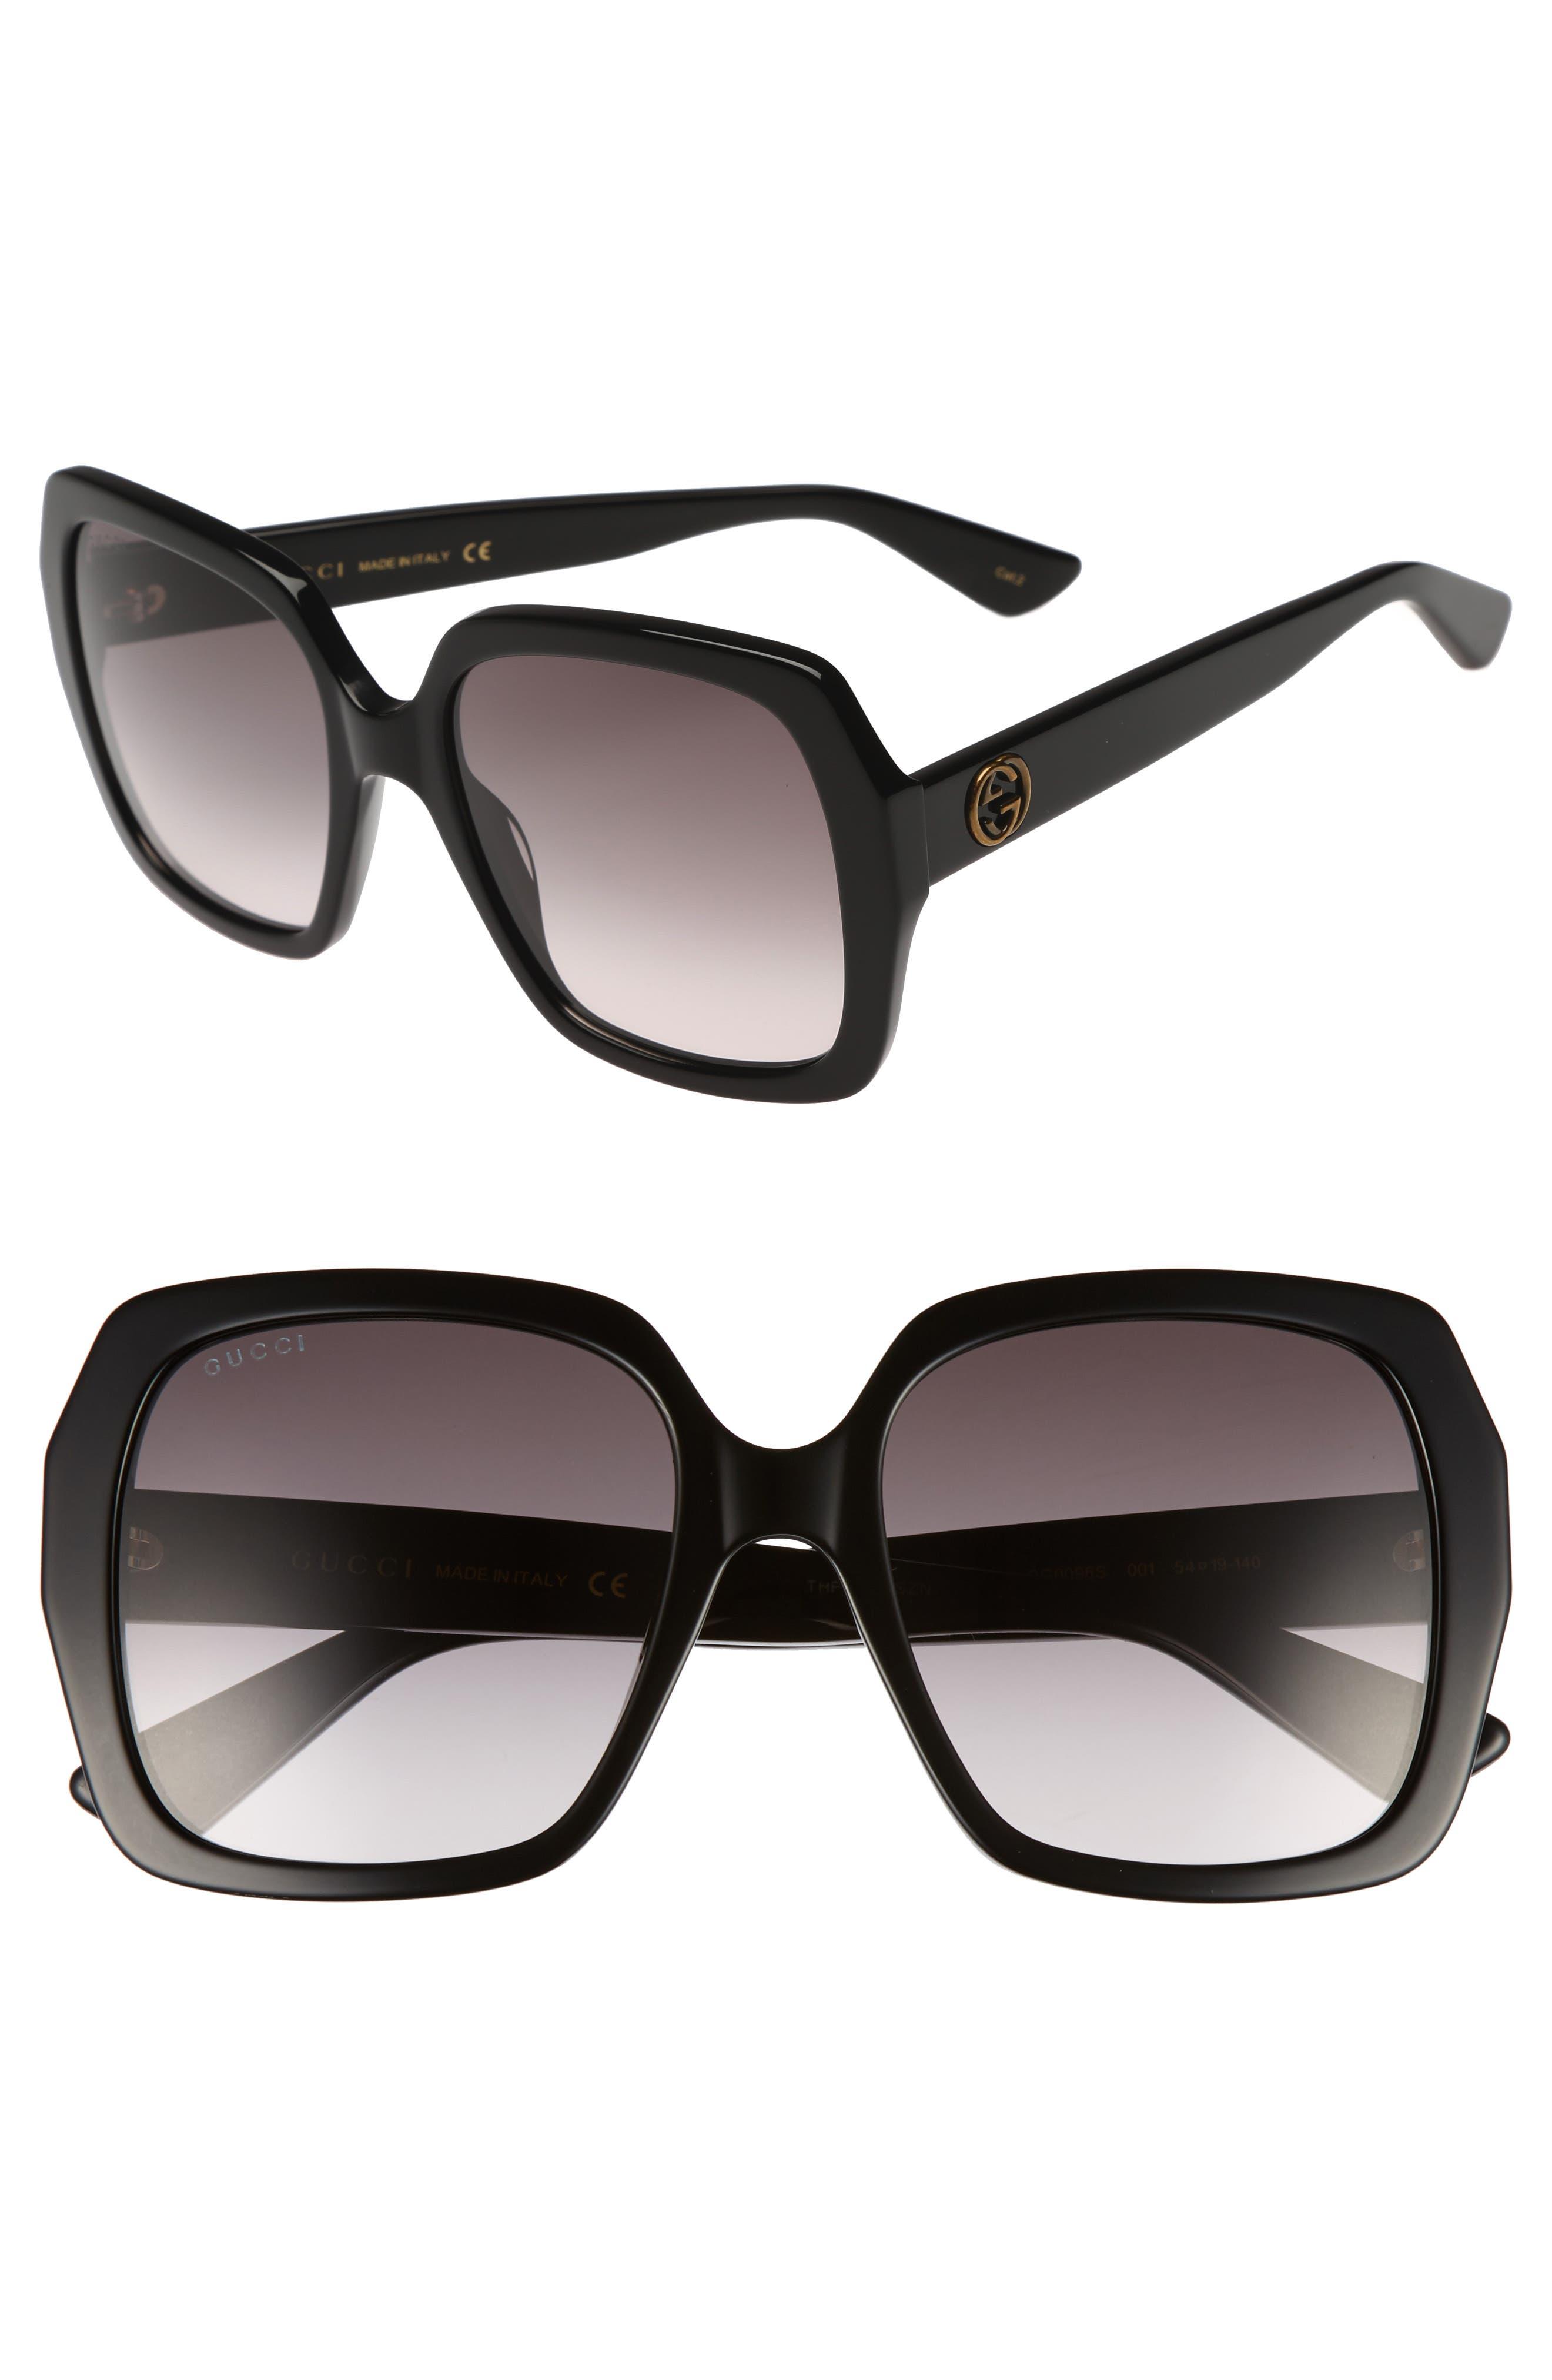 54mm Gradient Square Sunglasses,                             Main thumbnail 1, color,                             001